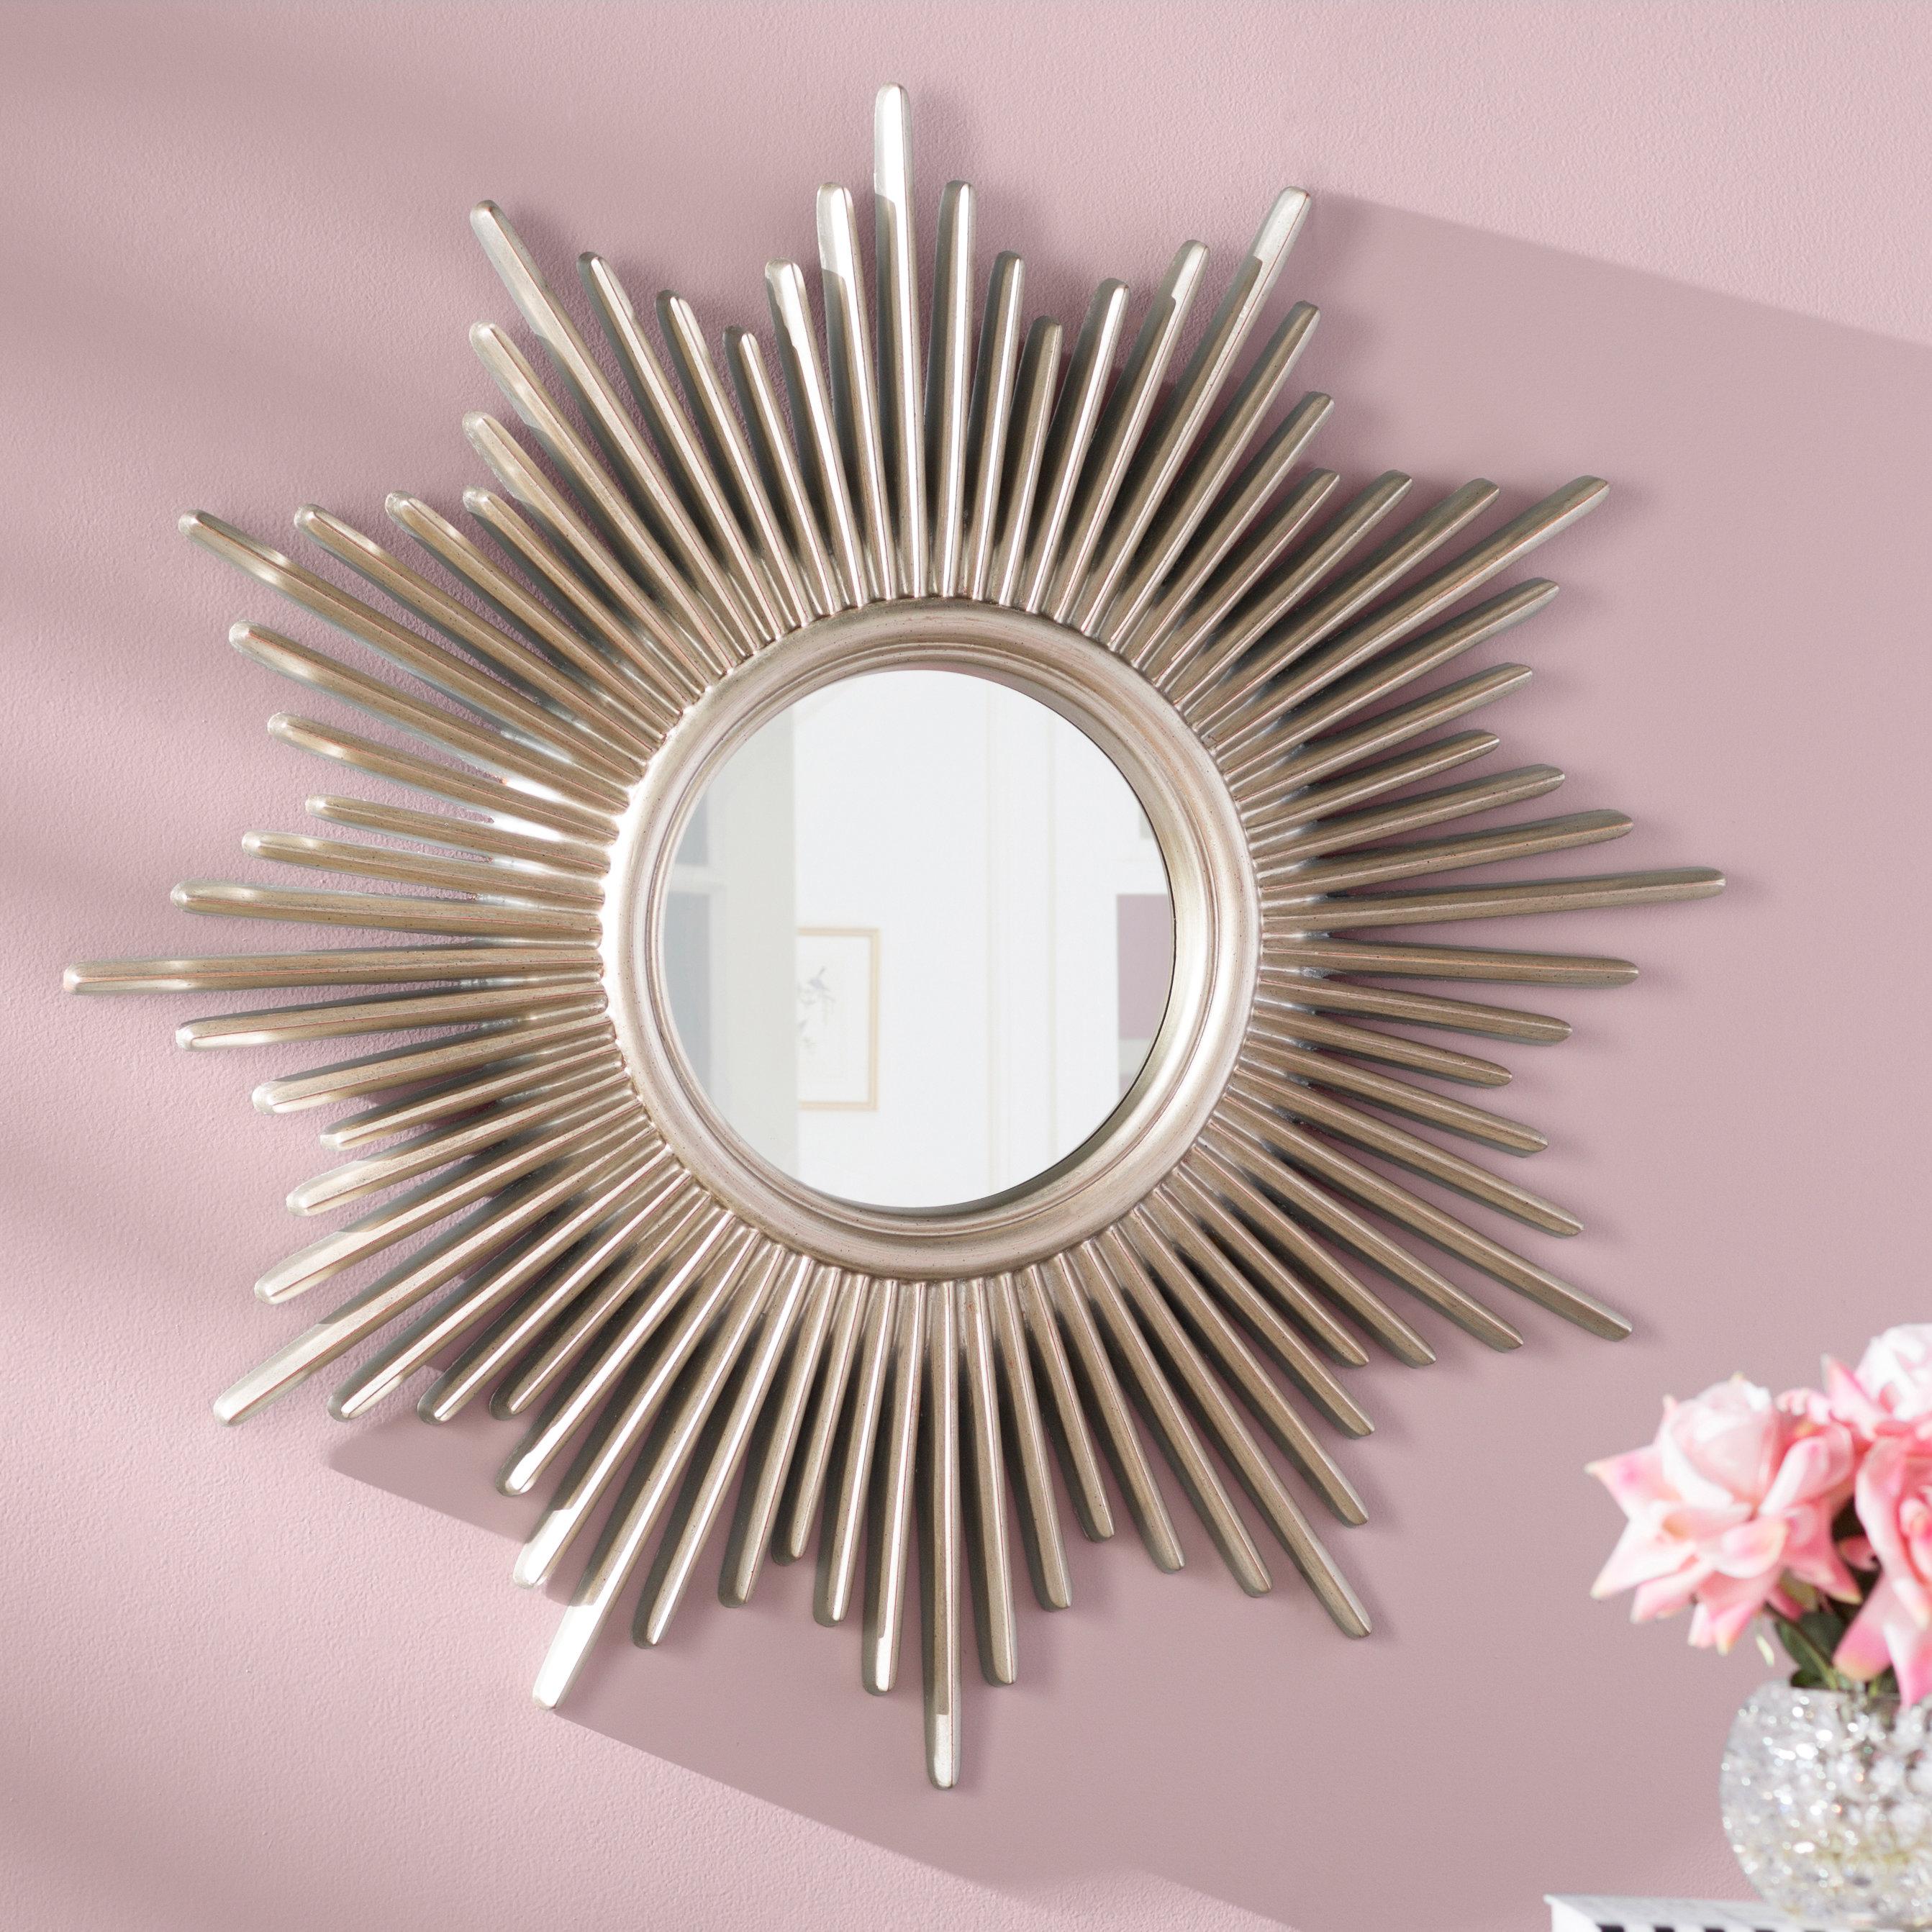 Josephson Starburst Glam Beveled Accent Wall Mirror Pertaining To Jarrod Sunburst Accent Mirrors (Image 11 of 20)